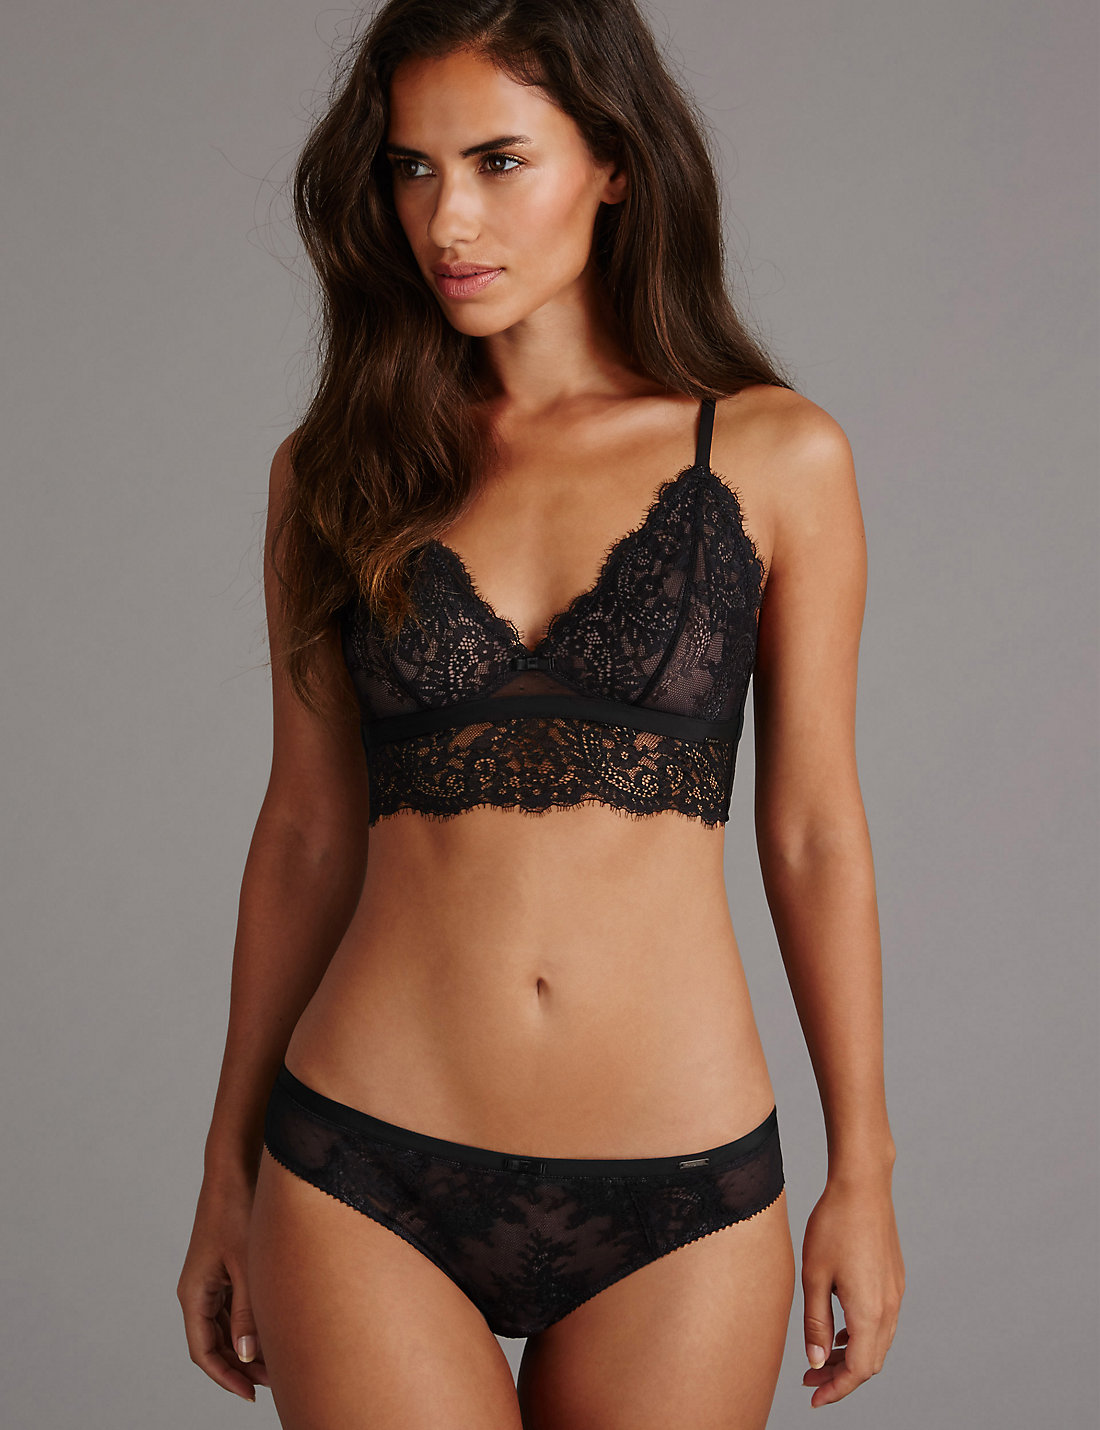 Sexy Lingerie & Underwear   Stockings & Suspender Belts   M&S